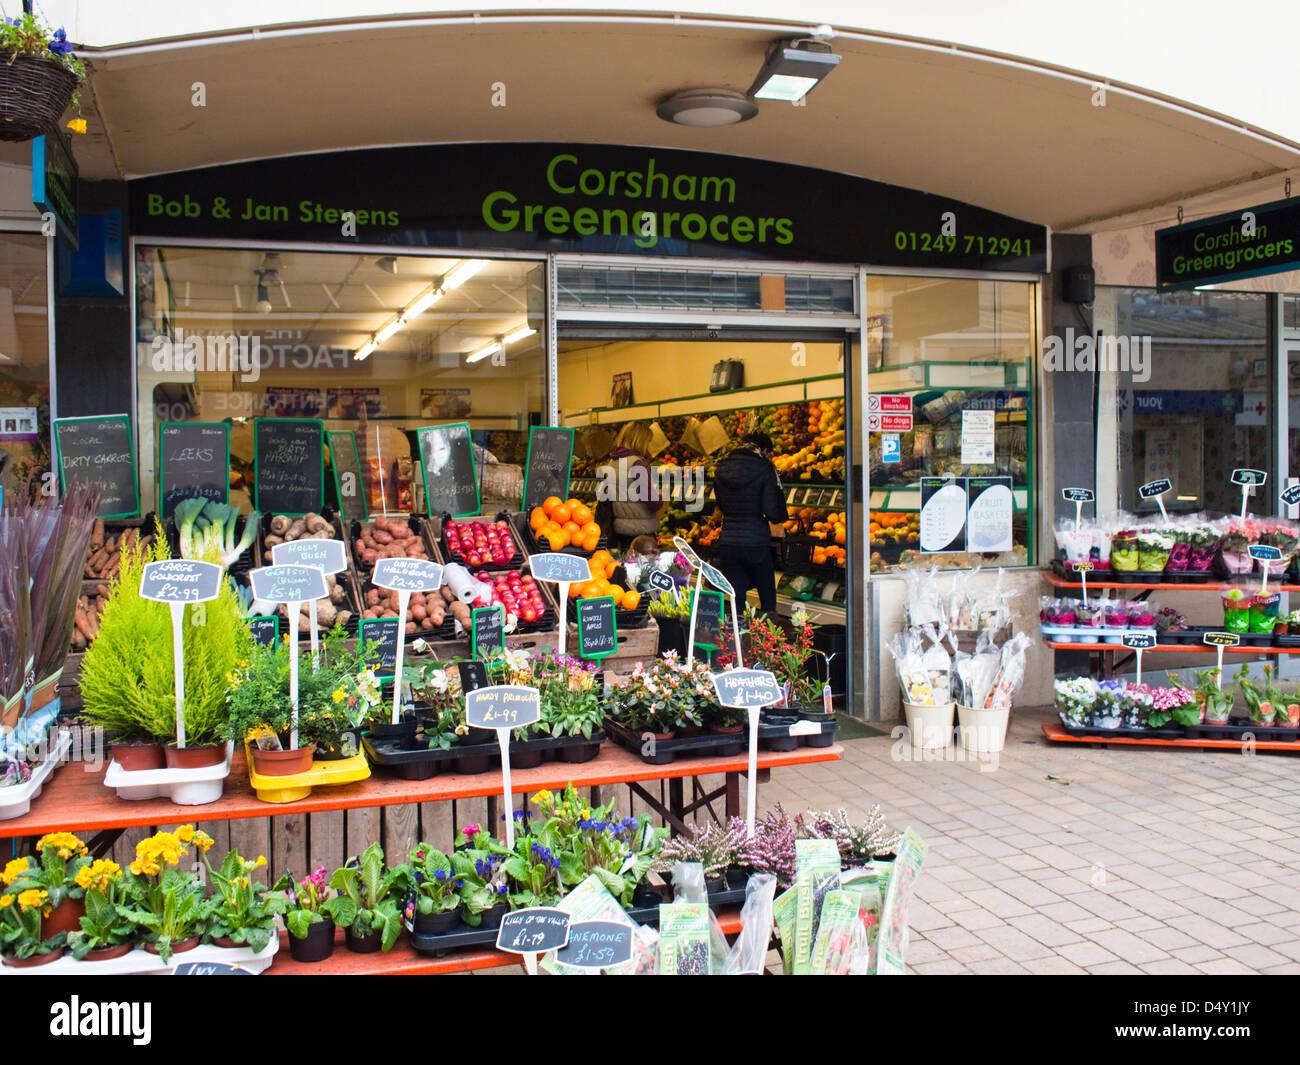 Corsham Greengrocers Wiltshire England UK - Stock Image